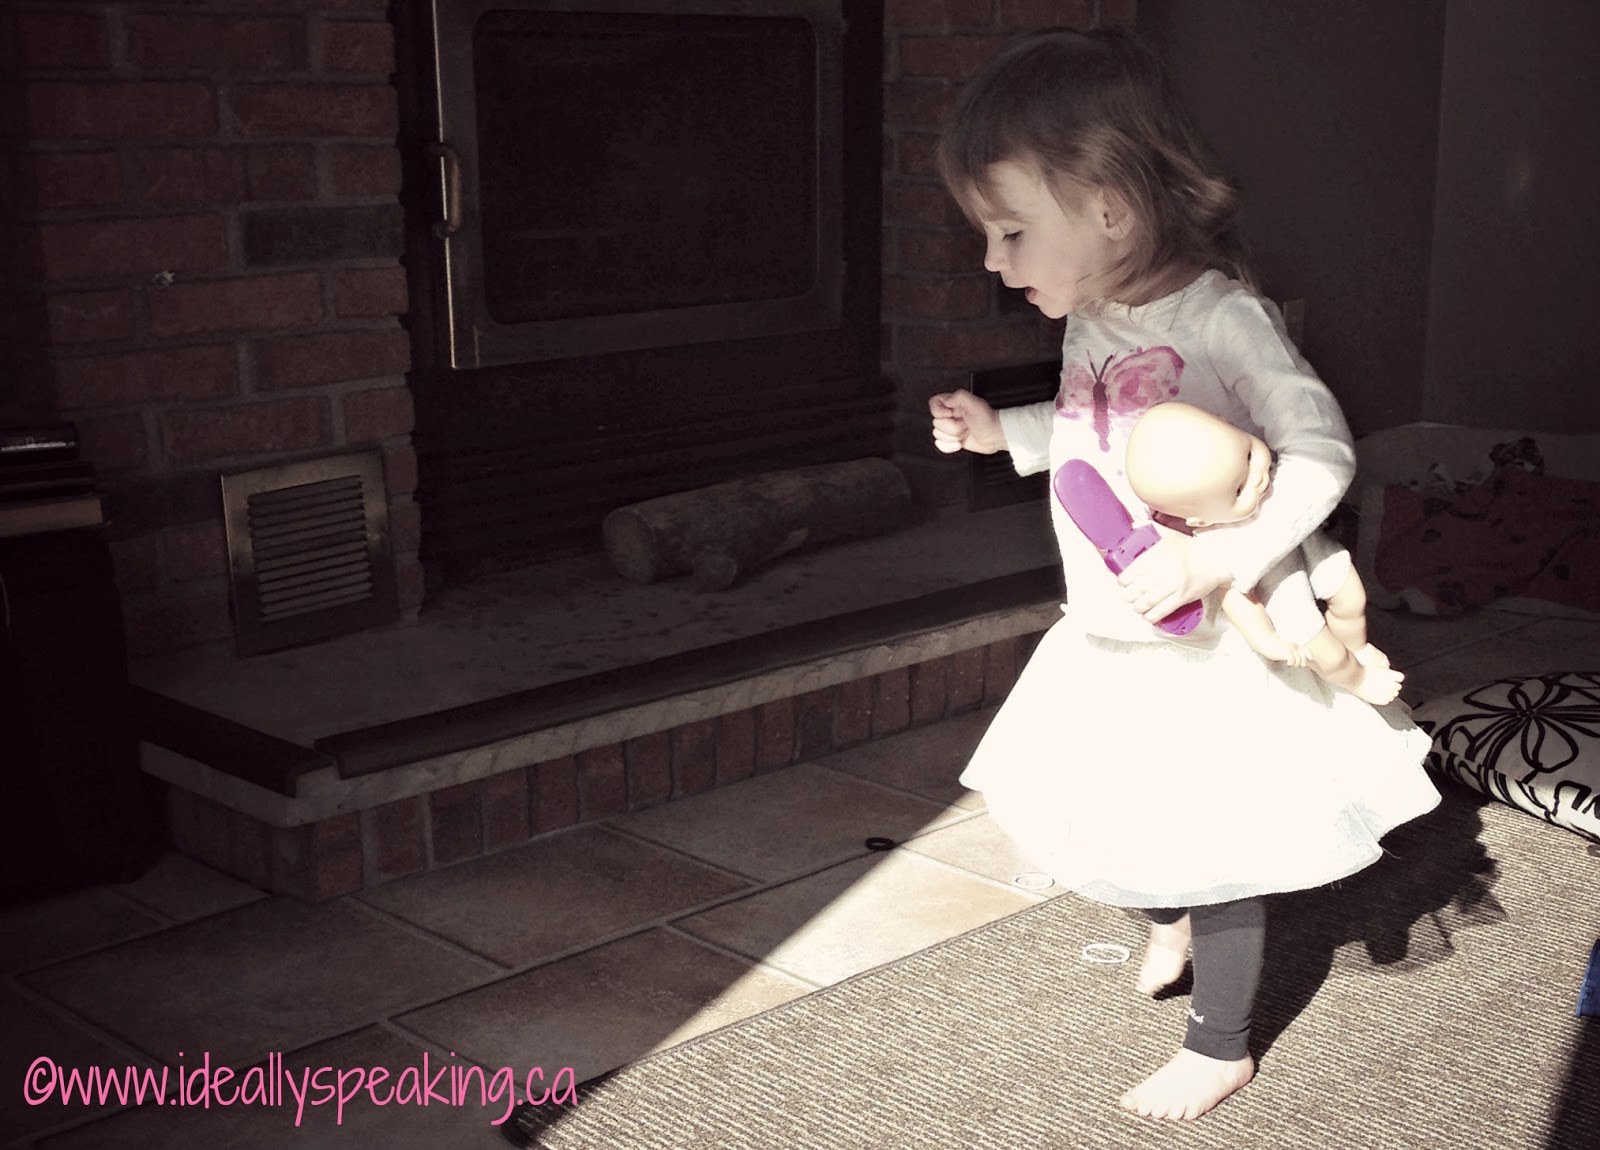 toddler ballerina dancing, cute, toddler, parenting, family, mom blog, mom blog canada, iphonetography